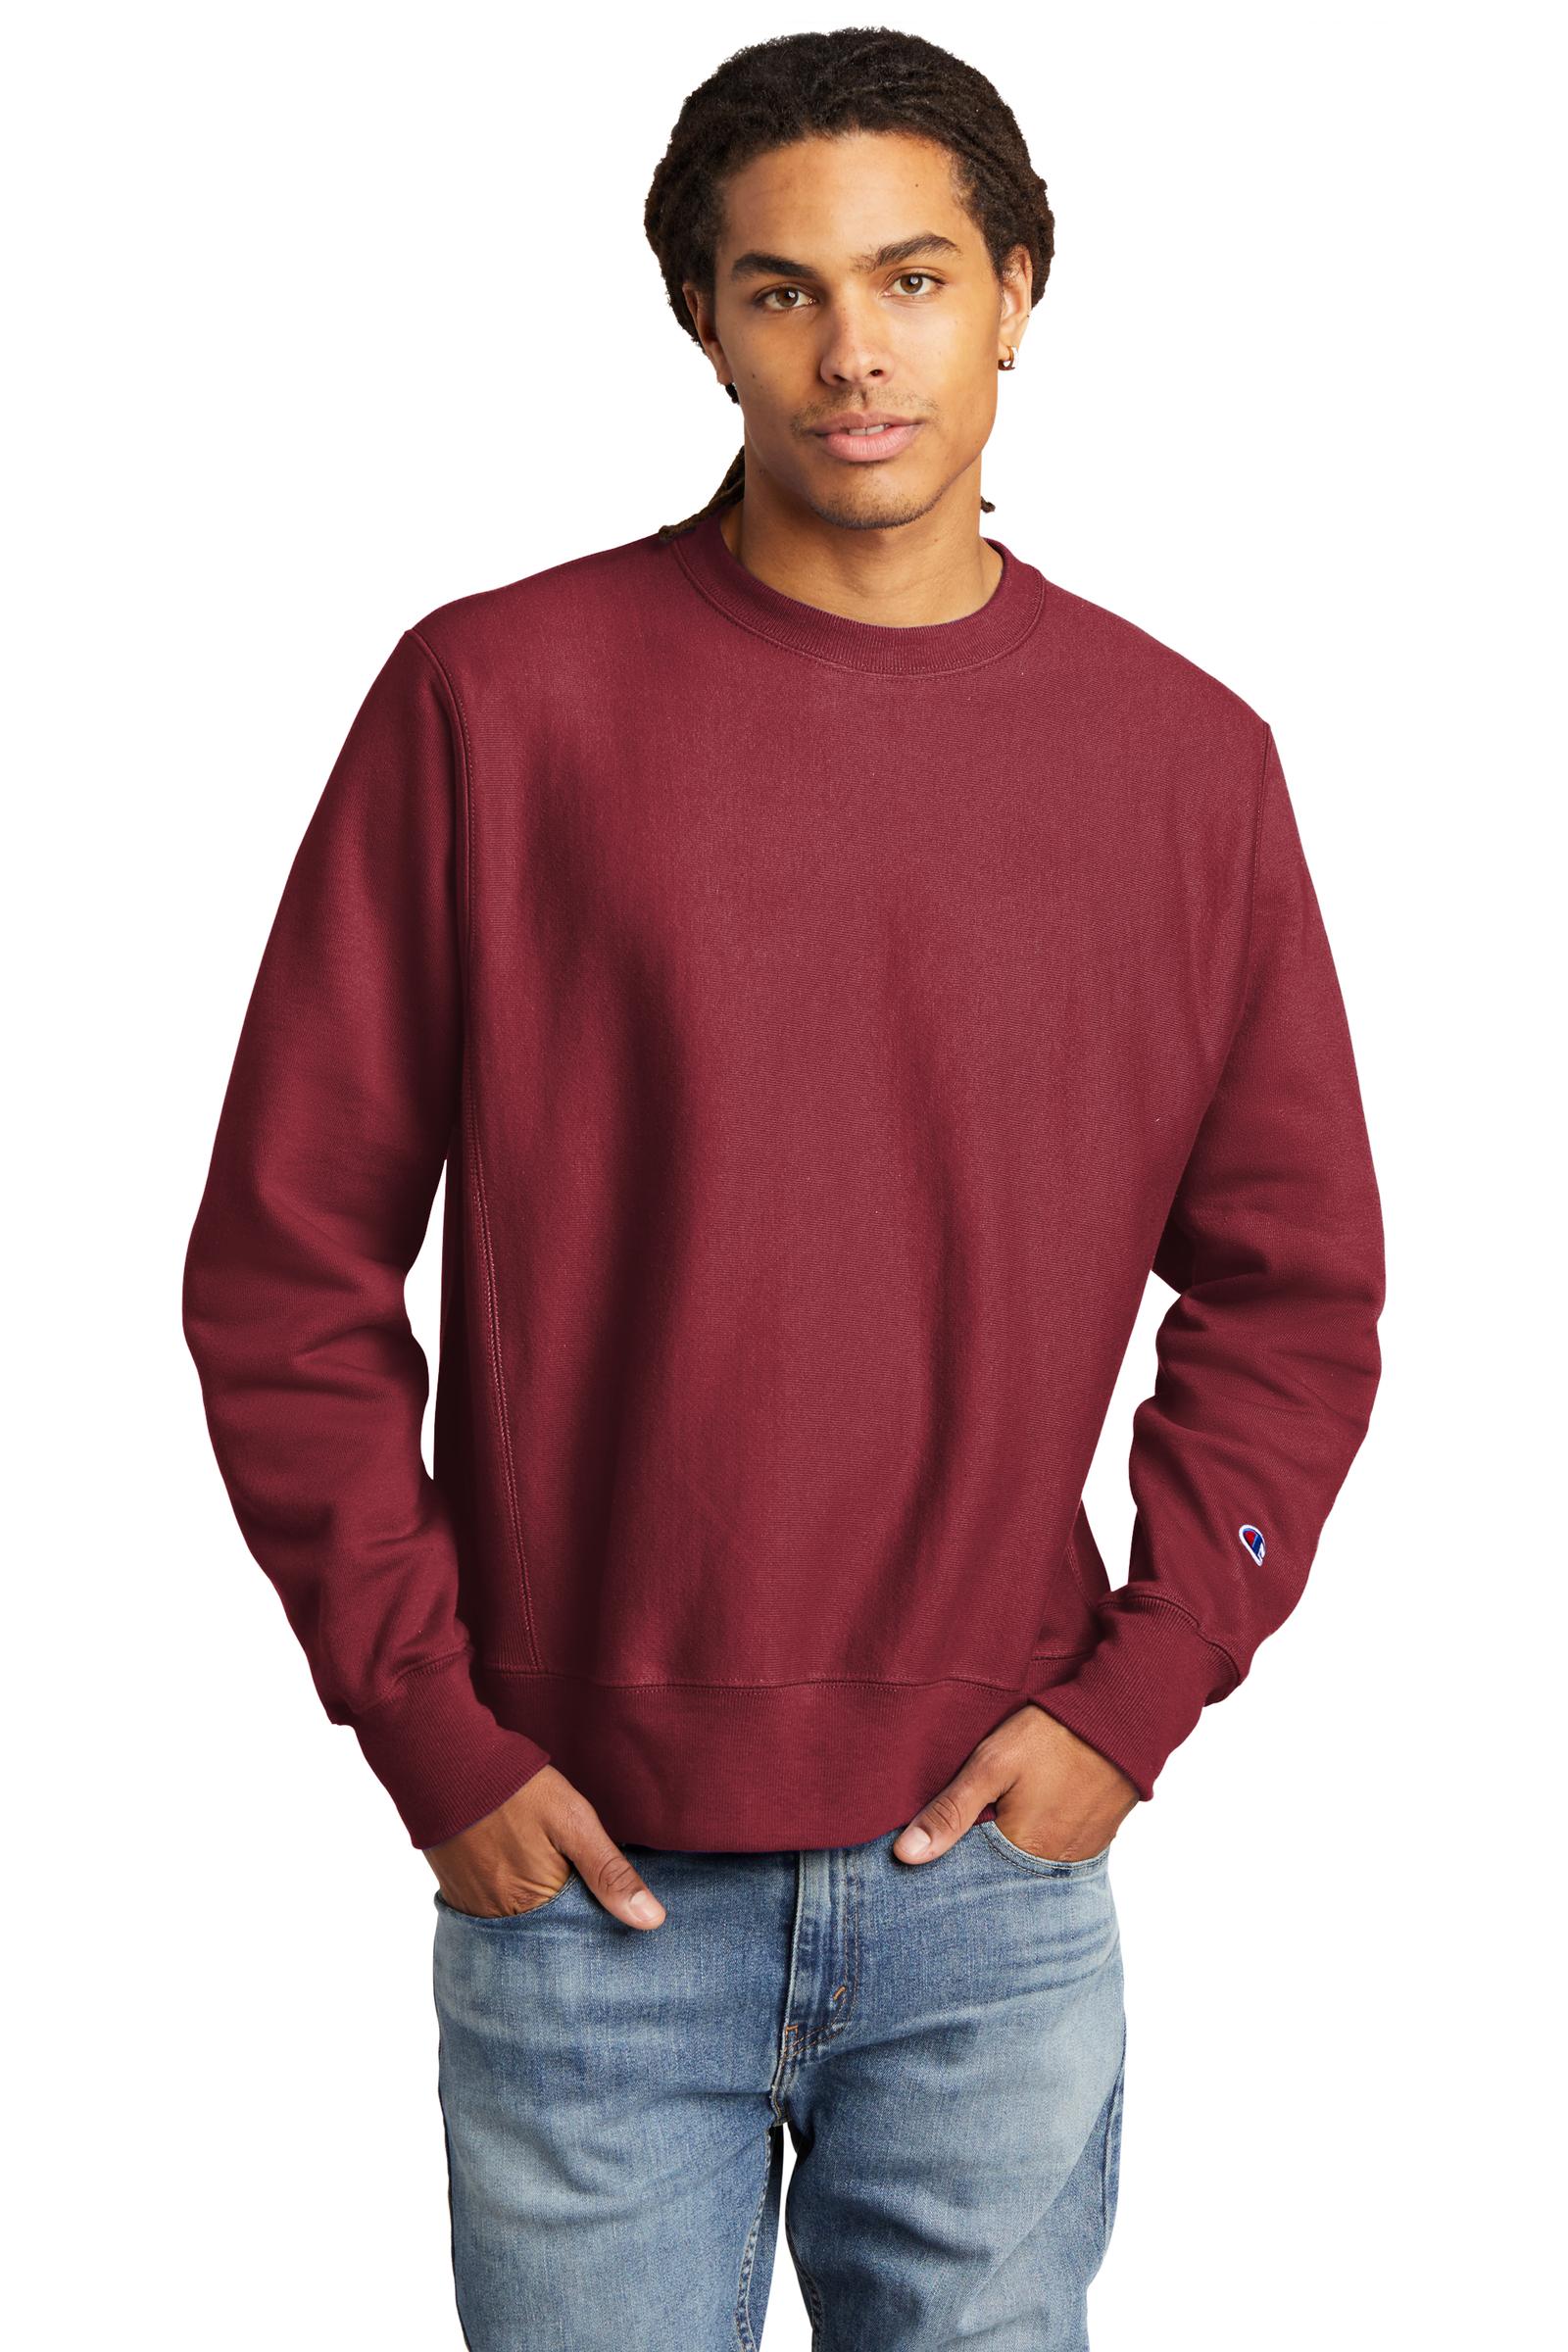 Champion Embroidered Men's Reverse Weave Crewneck Sweatshirt